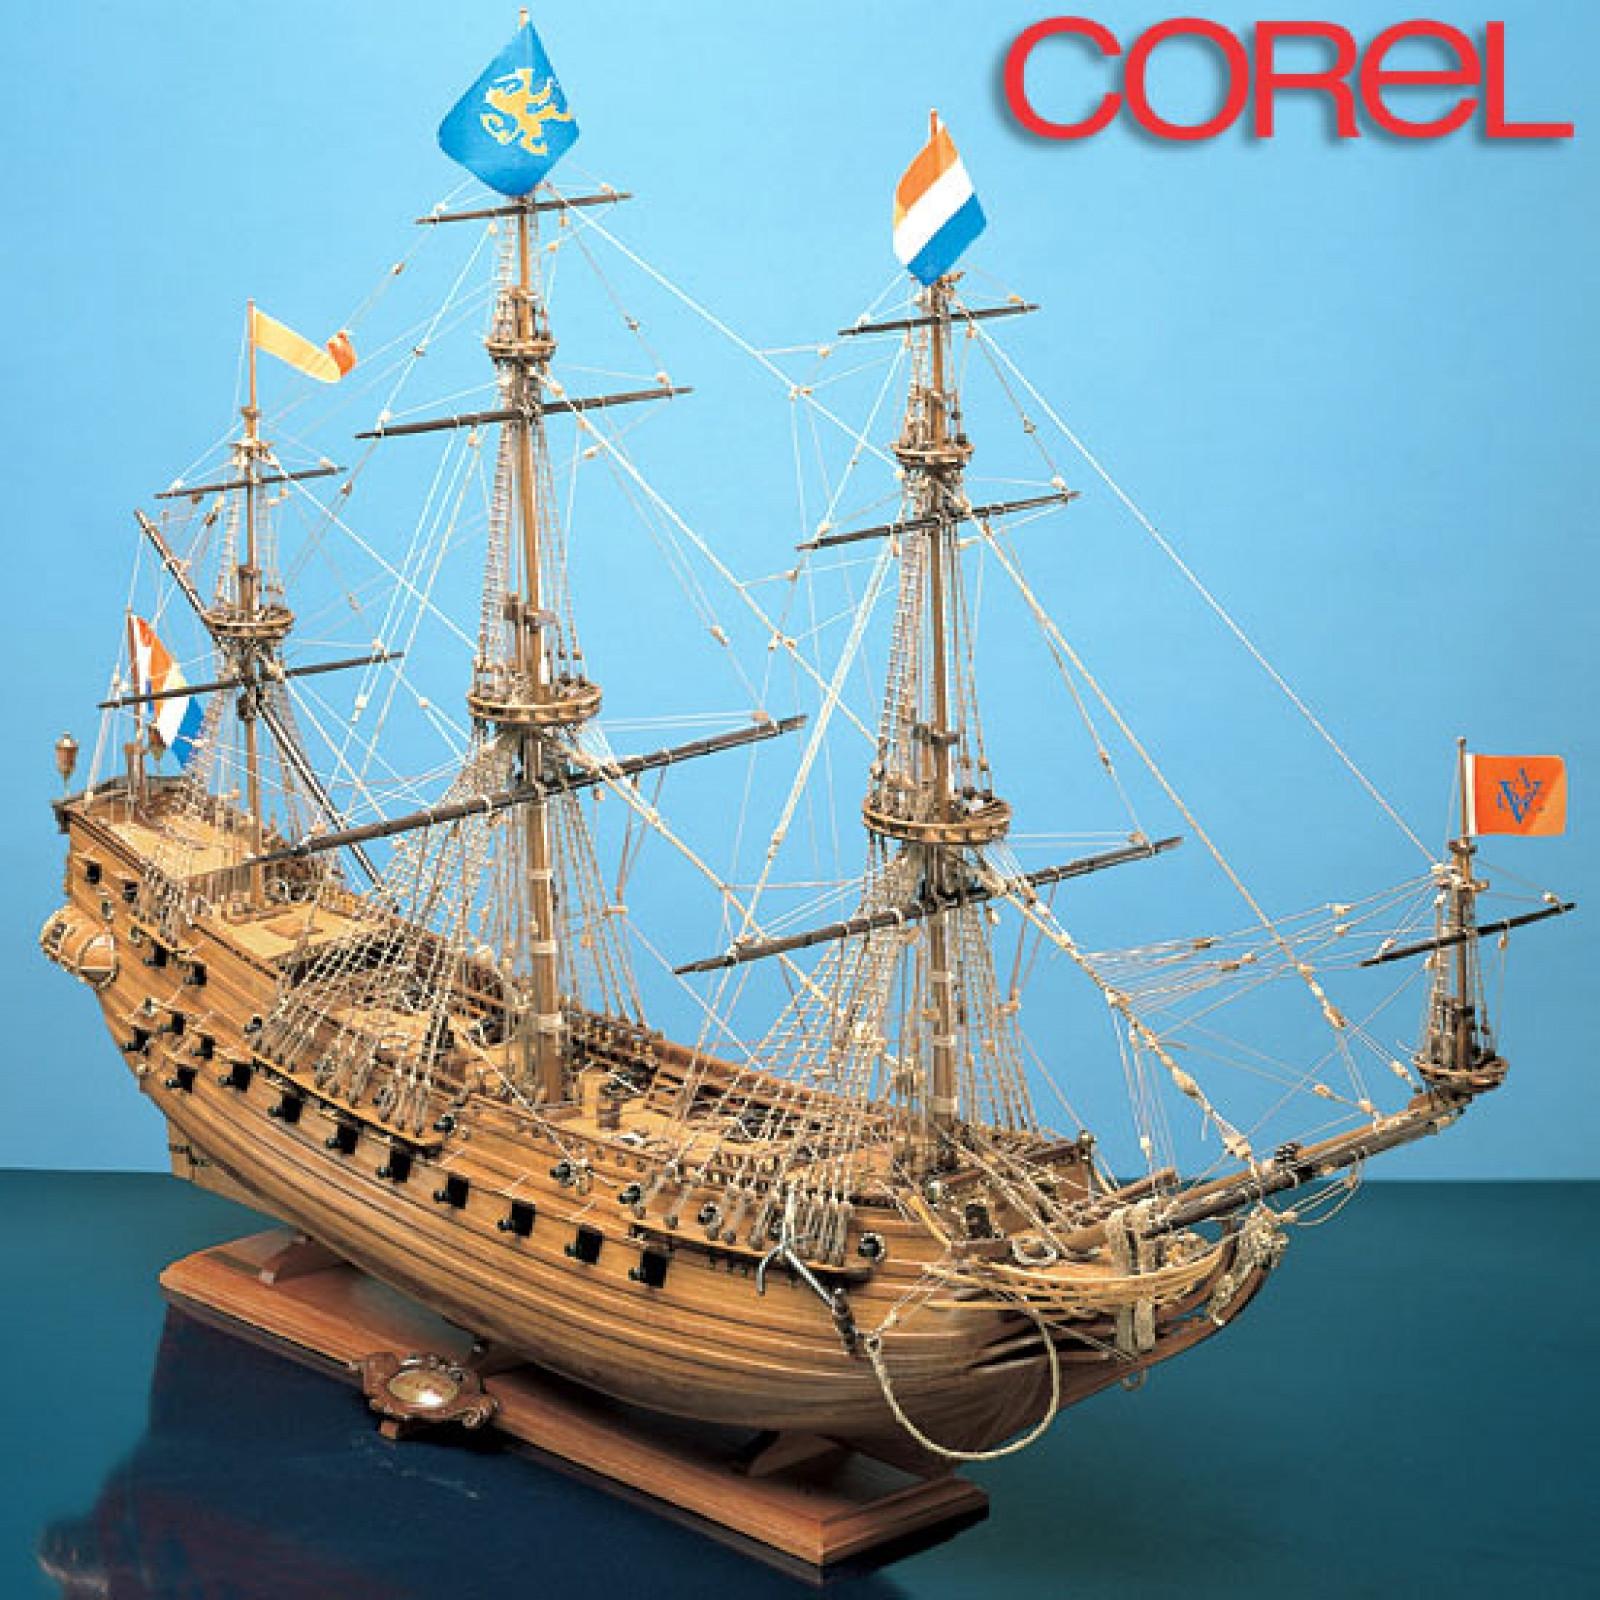 COREL PRINS WILLEM WOOD SHIP KIT 1:100 SCALE